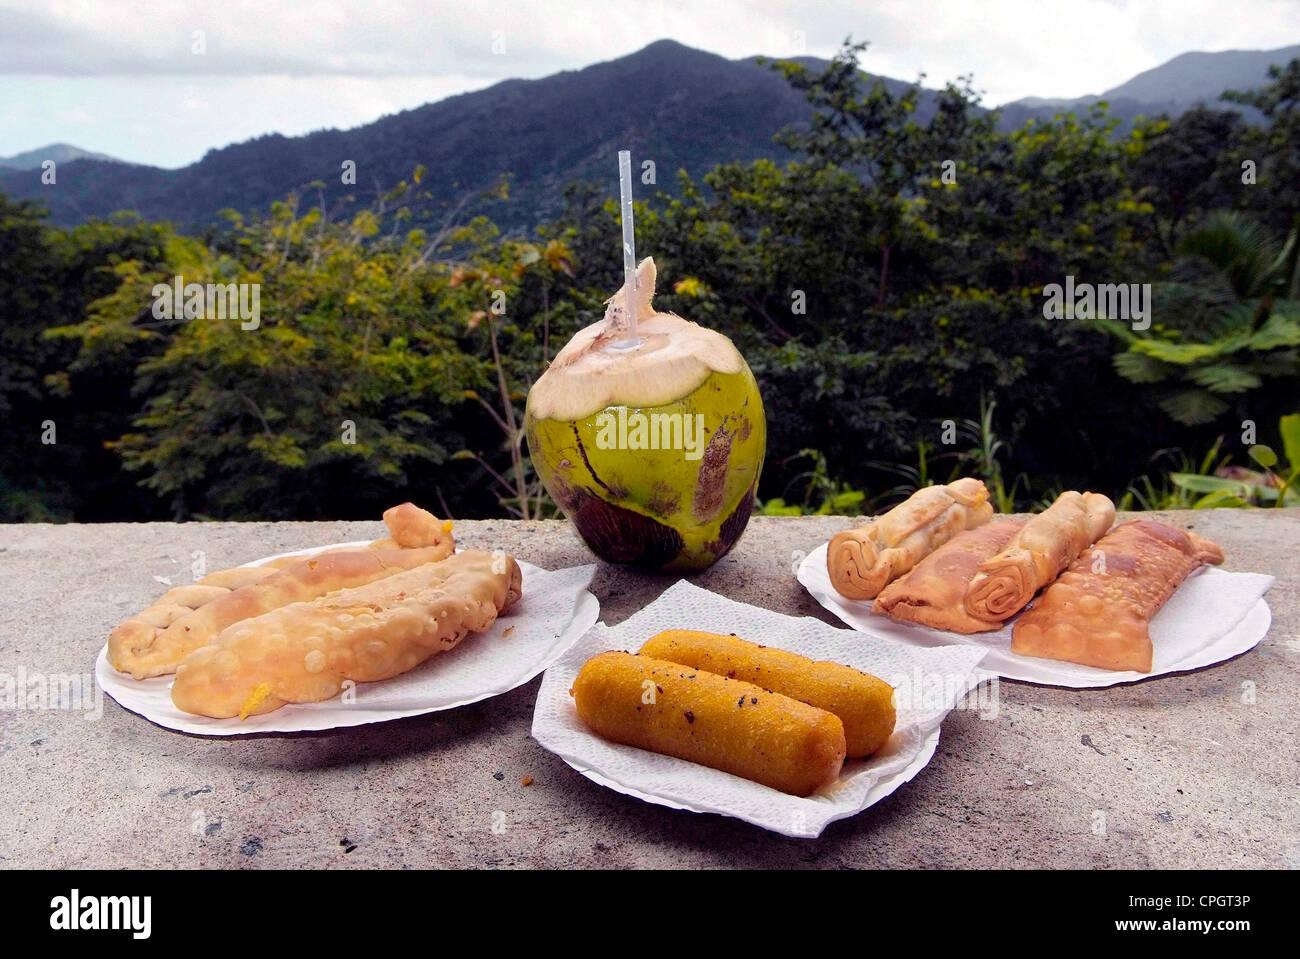 PUERTO RICO - comida típica isla Foto de stock